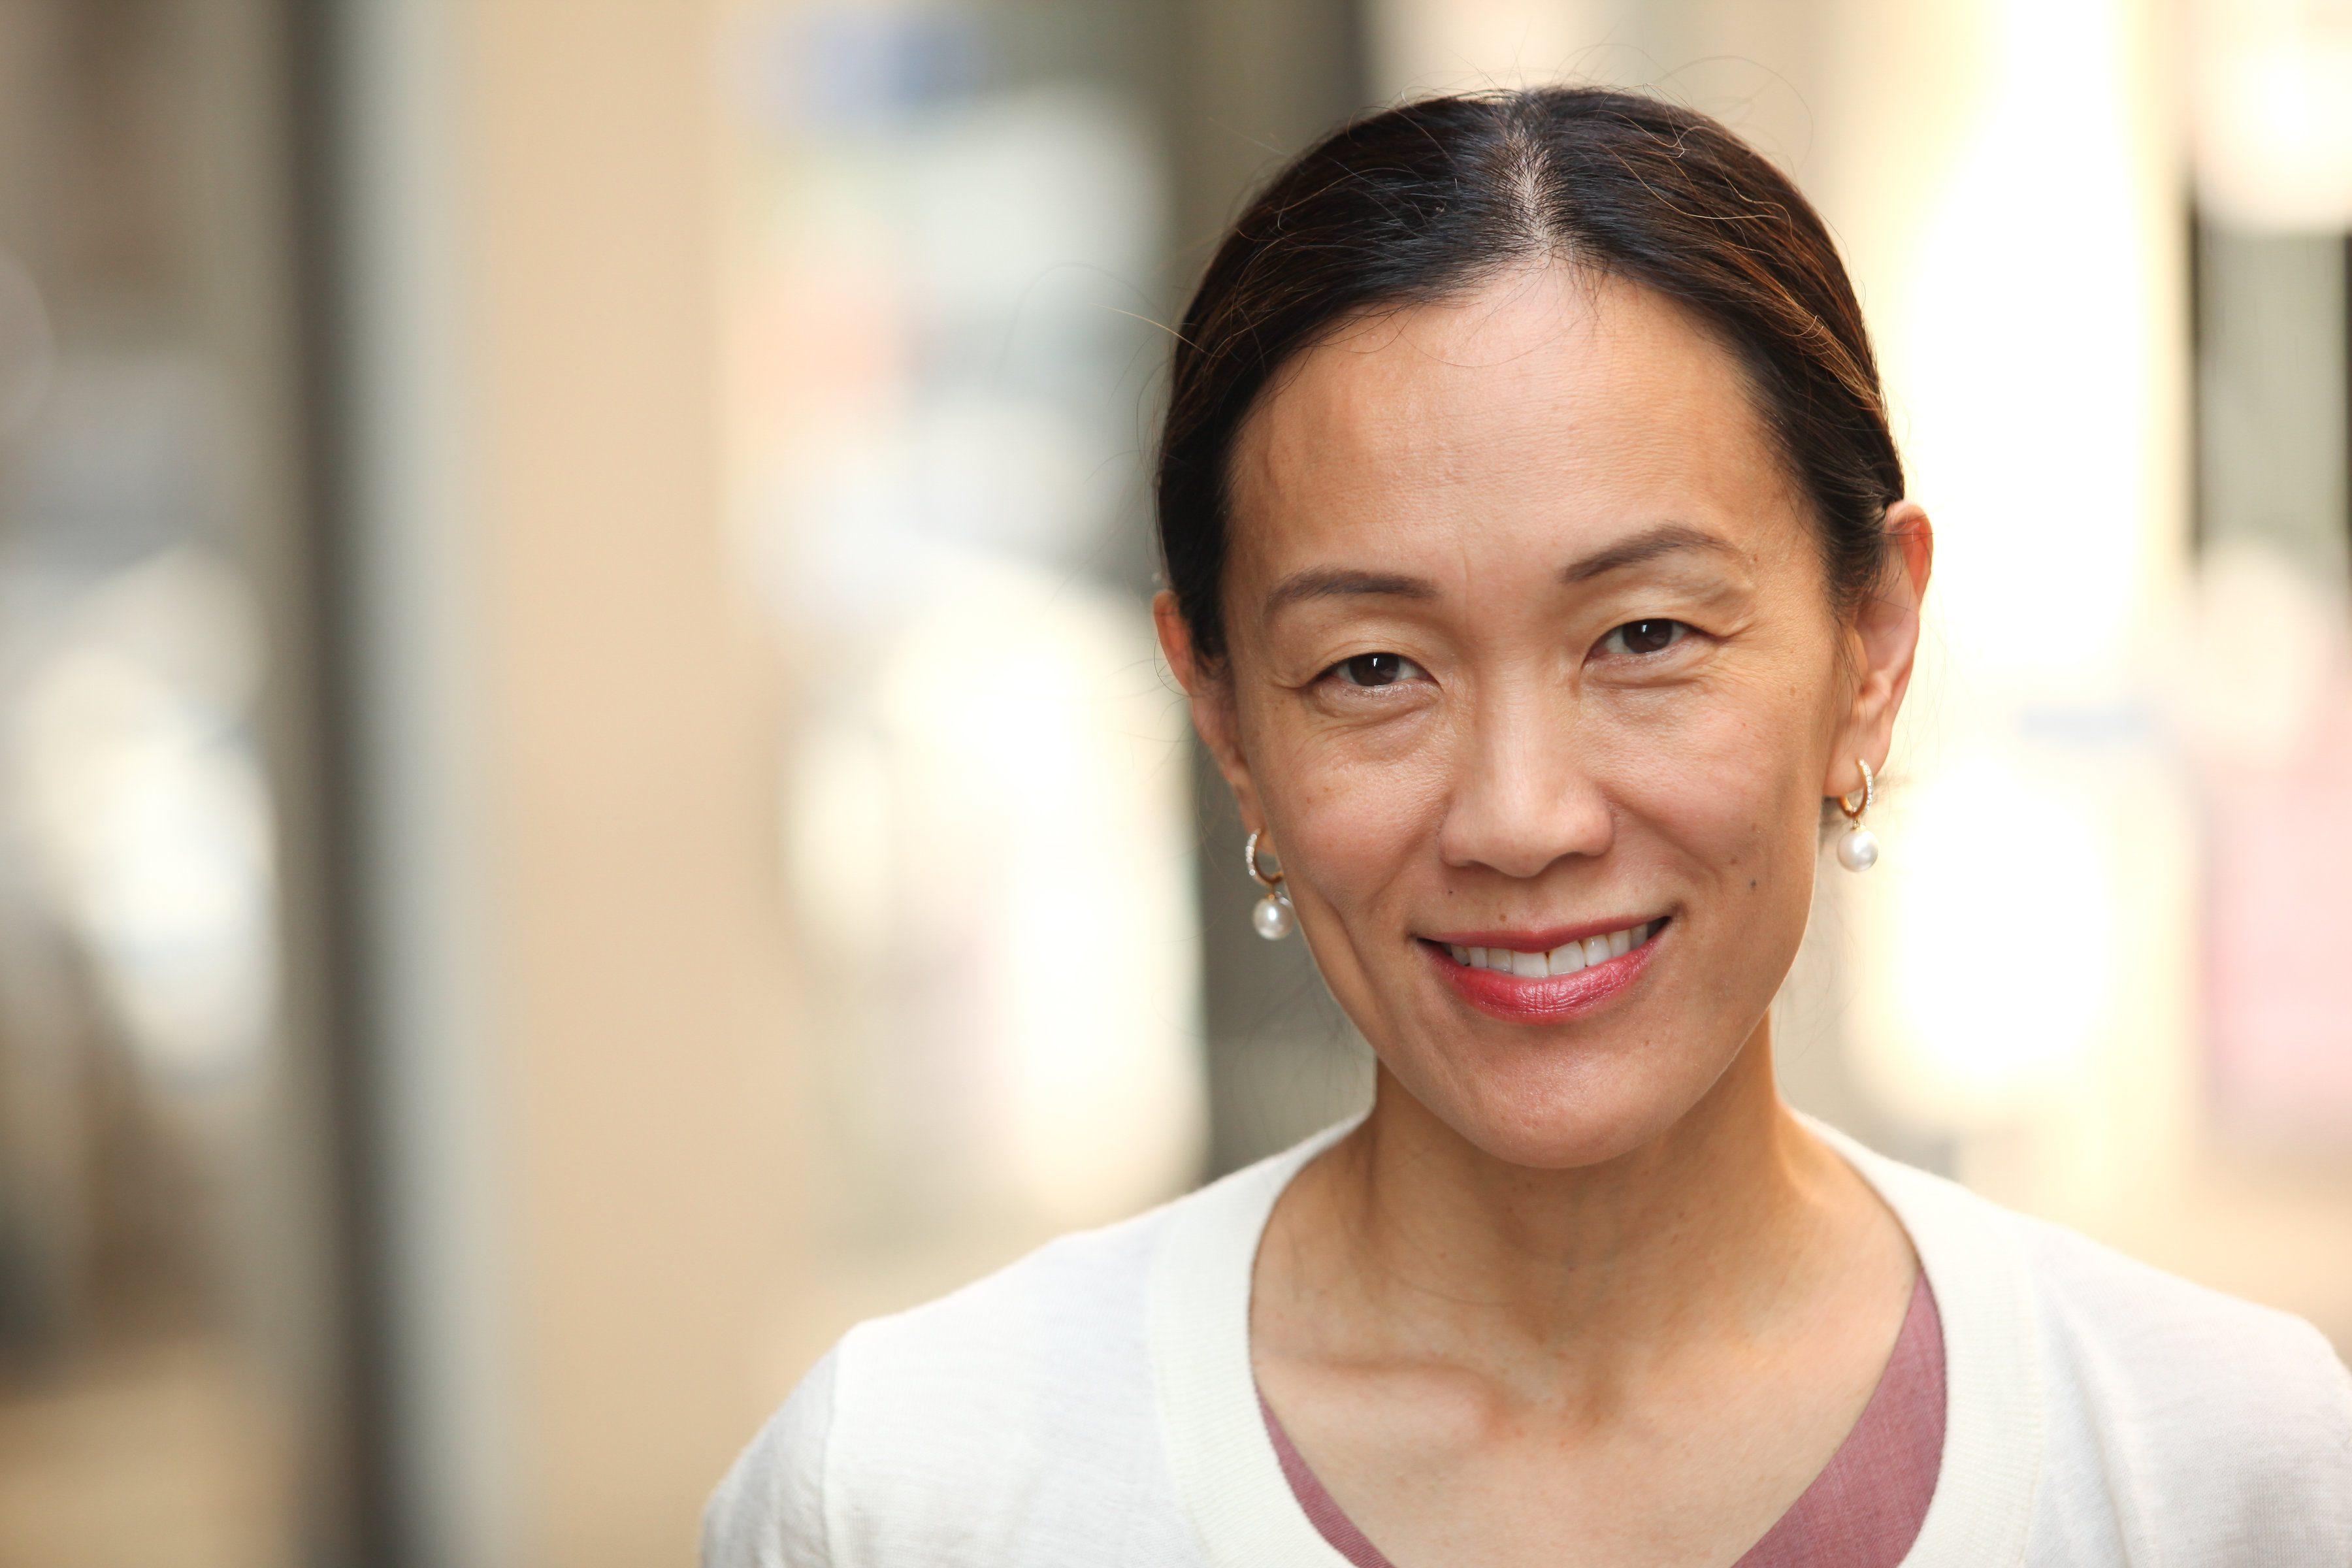 Alumni Profile: Esther Choo (JE '94, MD '01)